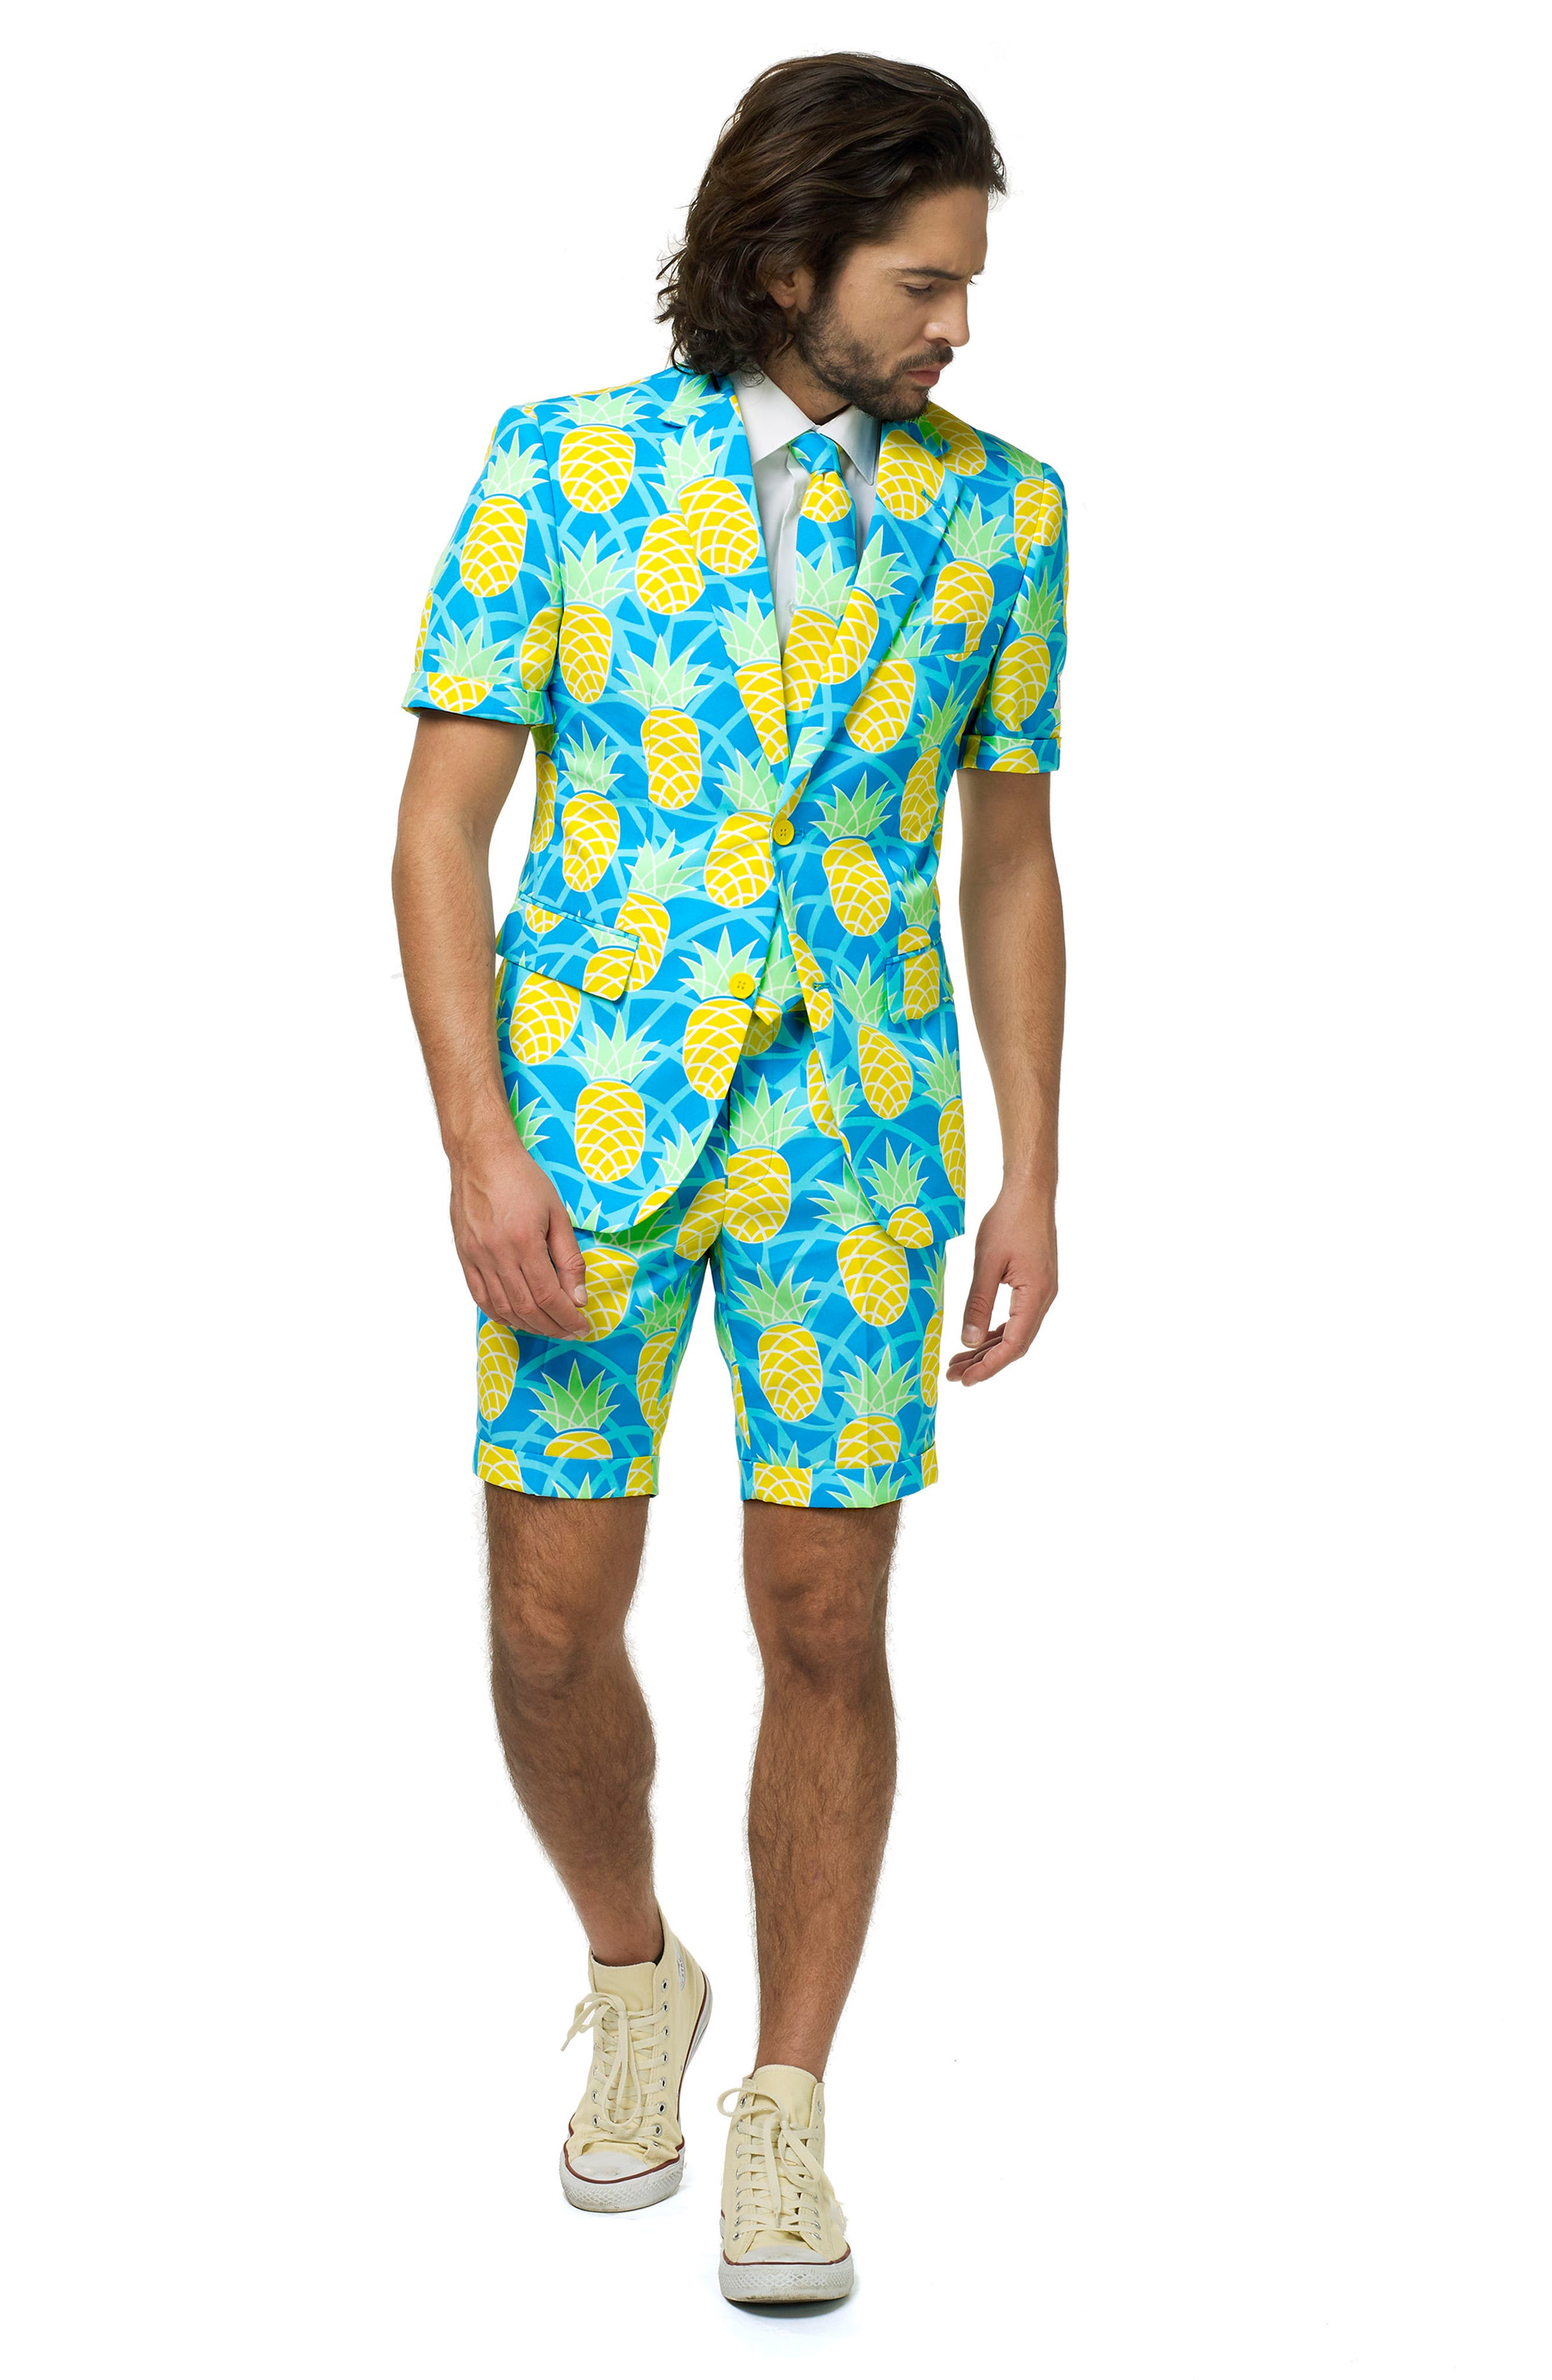 Shineapple Trim Fit Two-Piece Short Suit with Tie,                             Alternate thumbnail 4, color,                             400